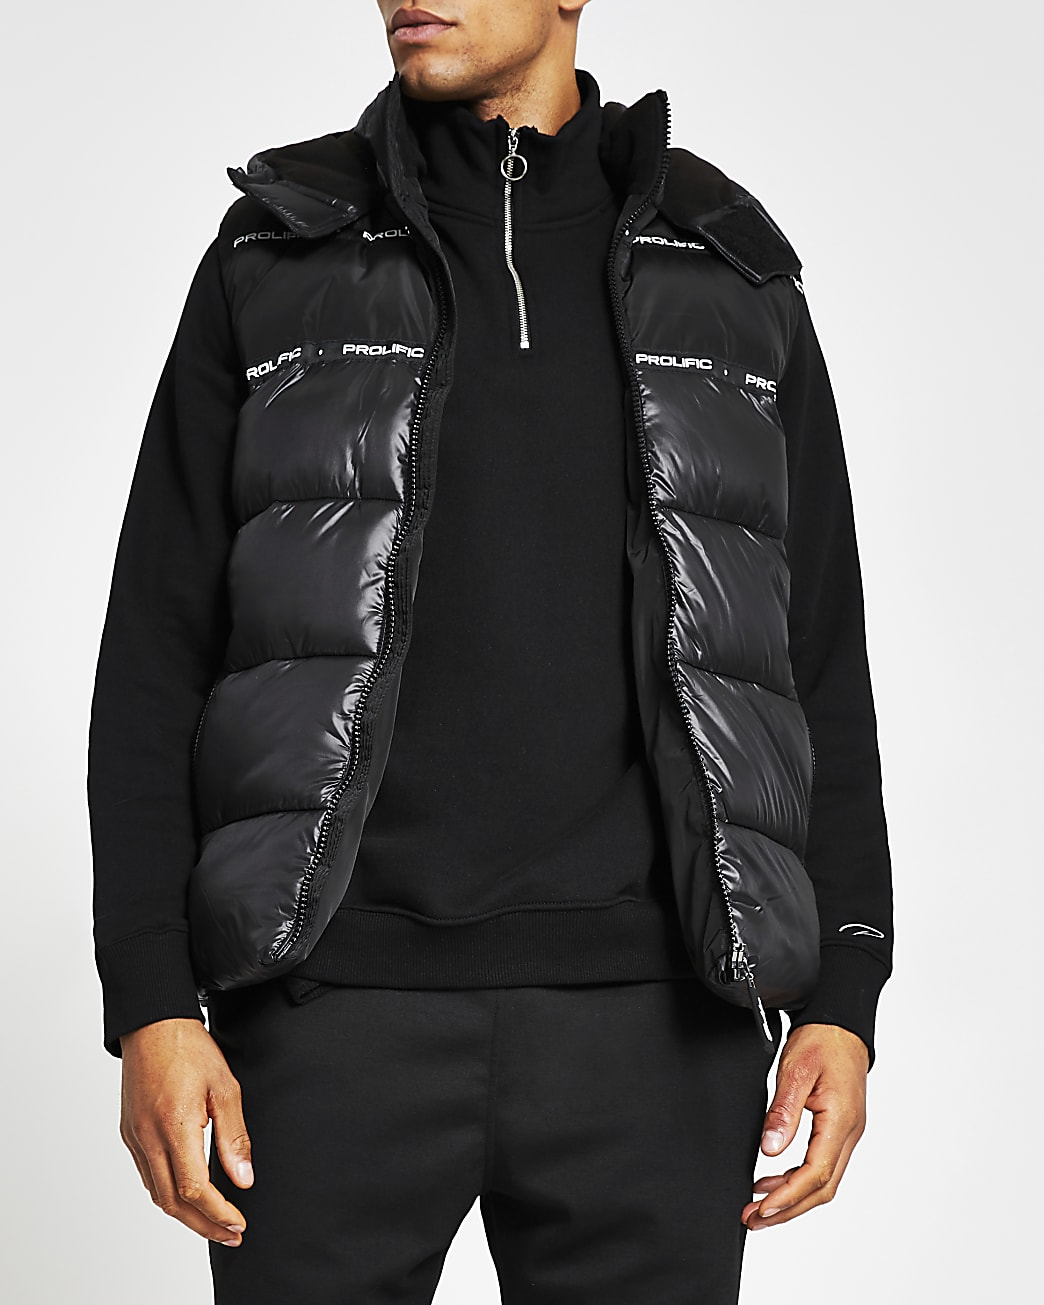 Black Prolific wet look hooded gilet